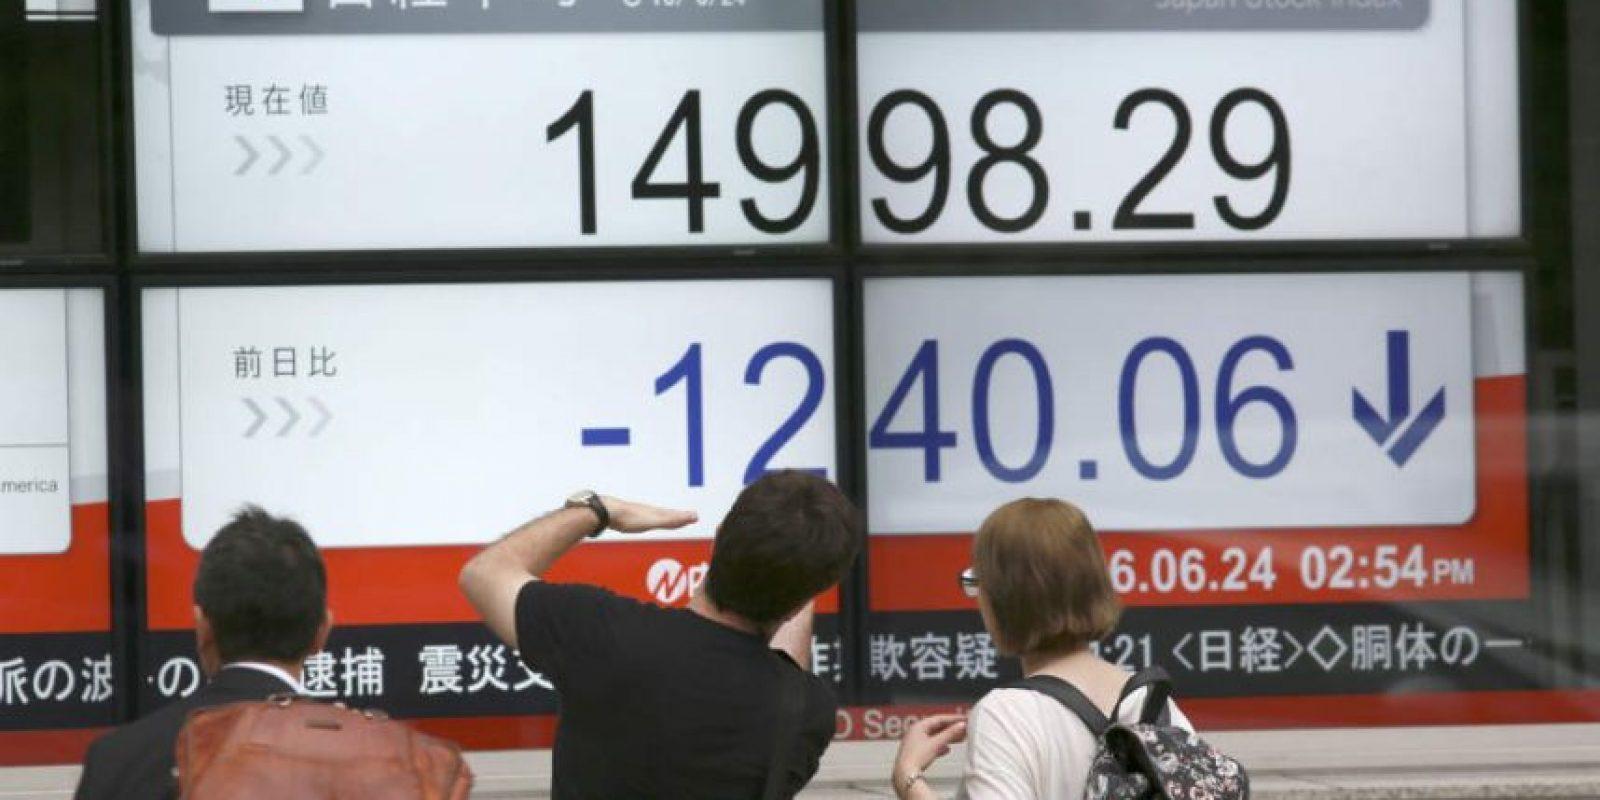 El índice Nikkei se desplomó un 7. 92% Foto:AP